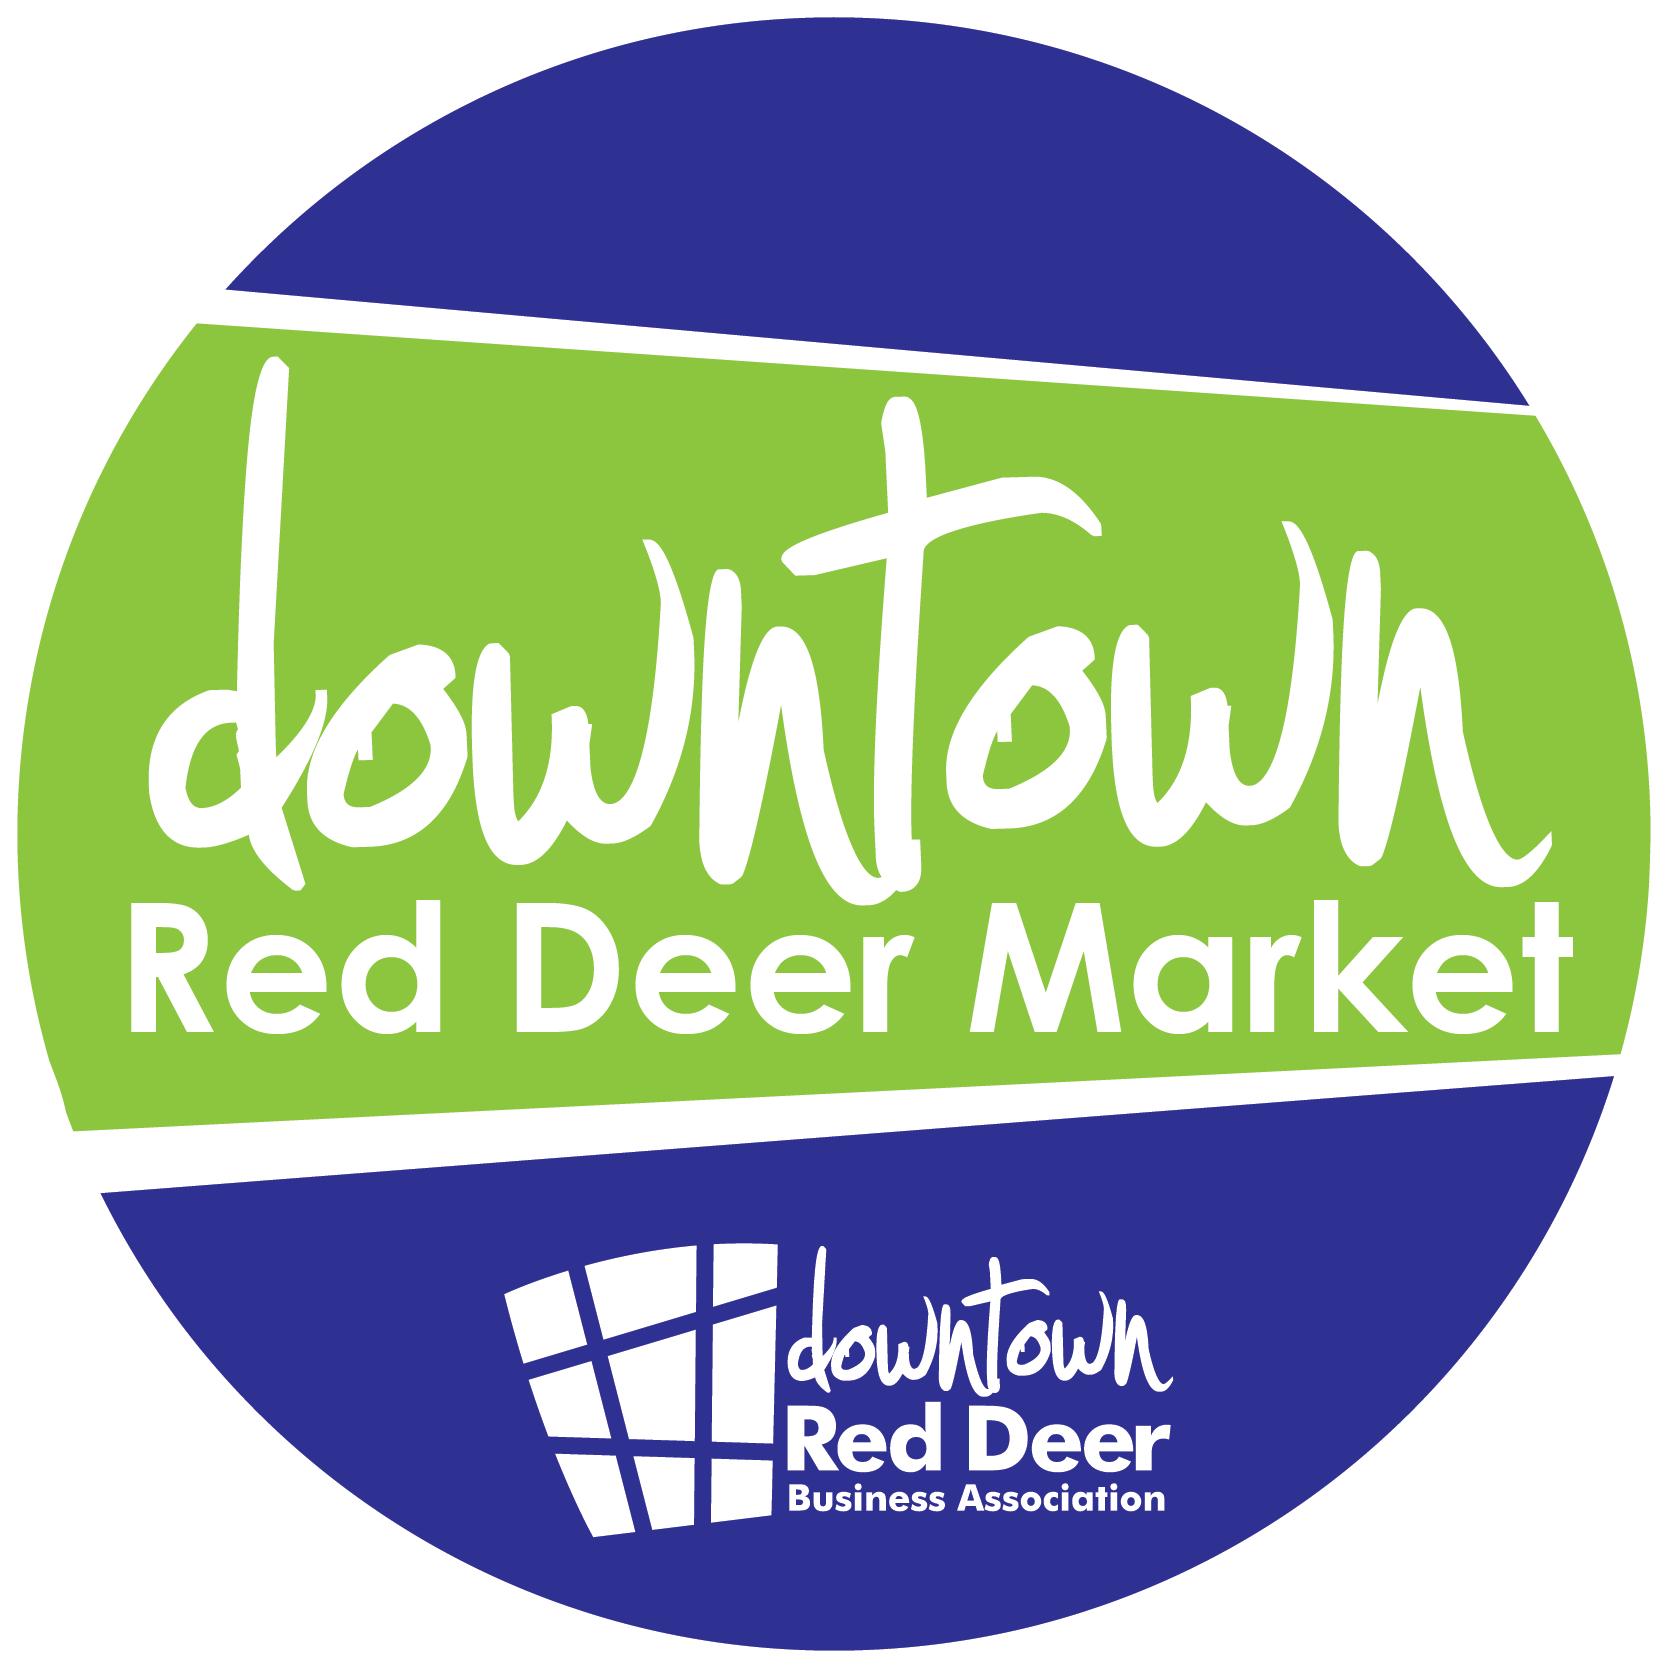 Red Deer Downtown Market